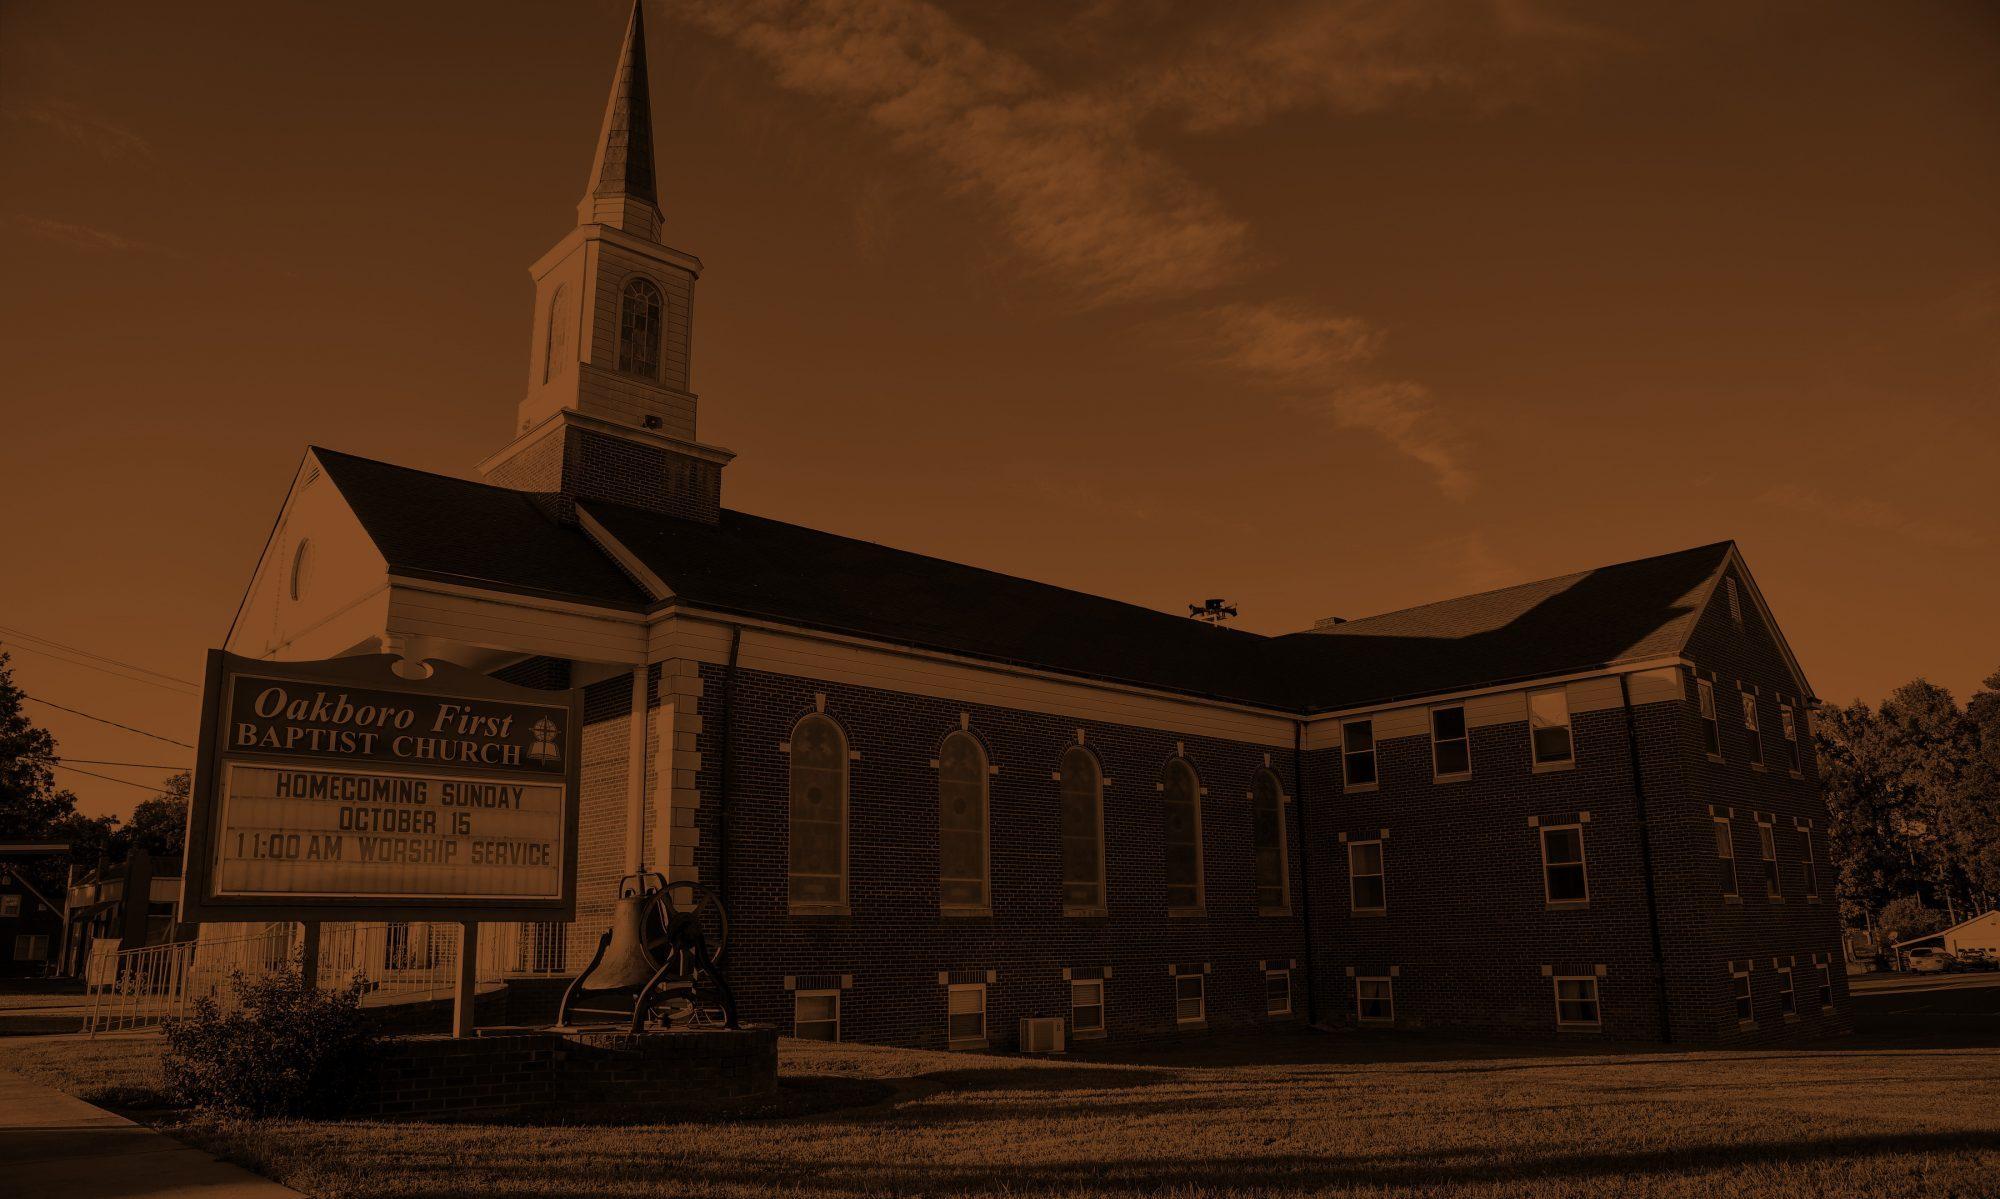 First Baptist Church Oakboro